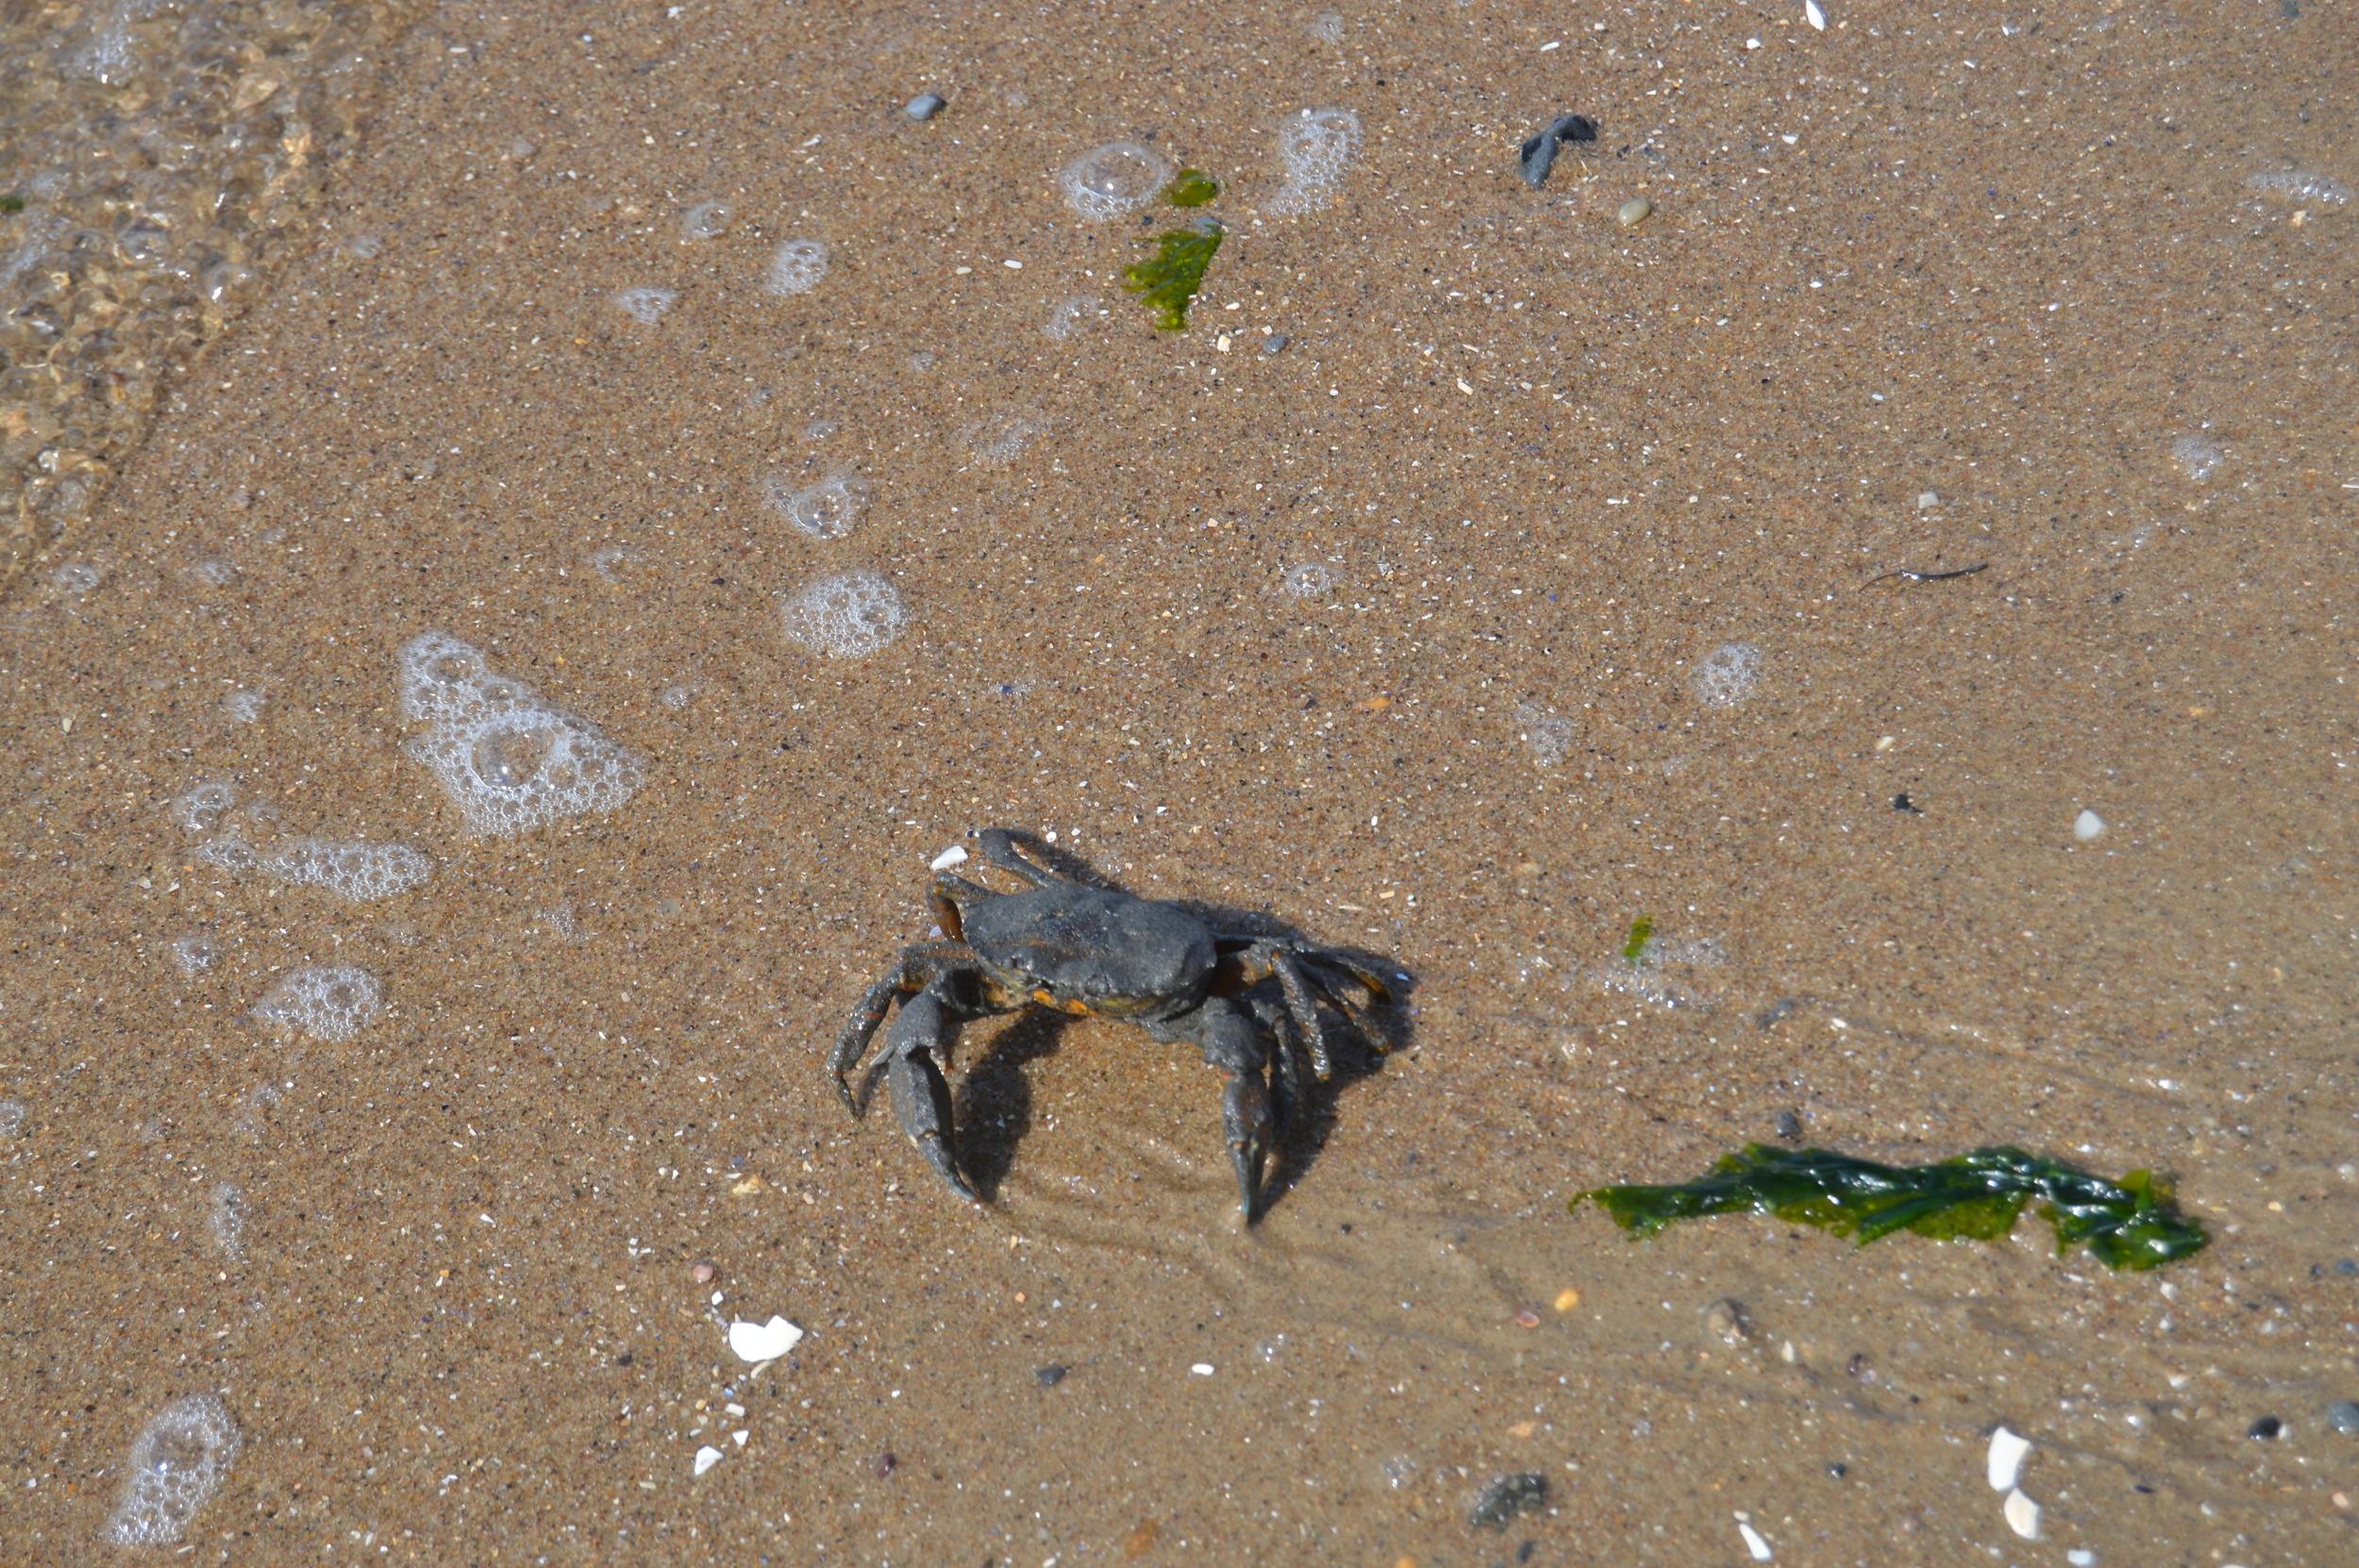 Plumb Beach Crab 9-20-2014.JPG